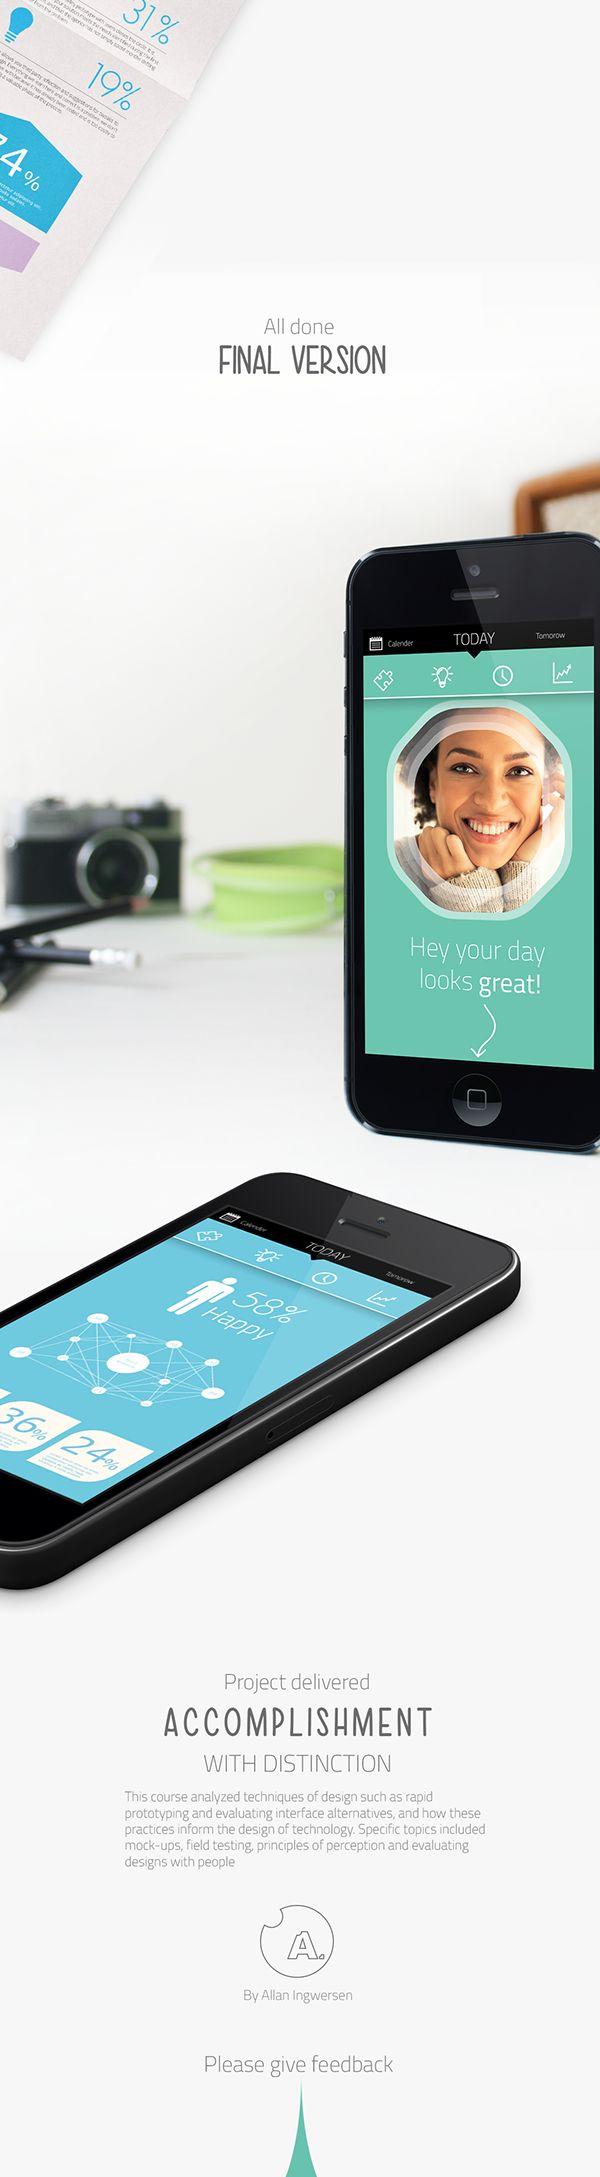 LifePuzzle - App concept on Behance